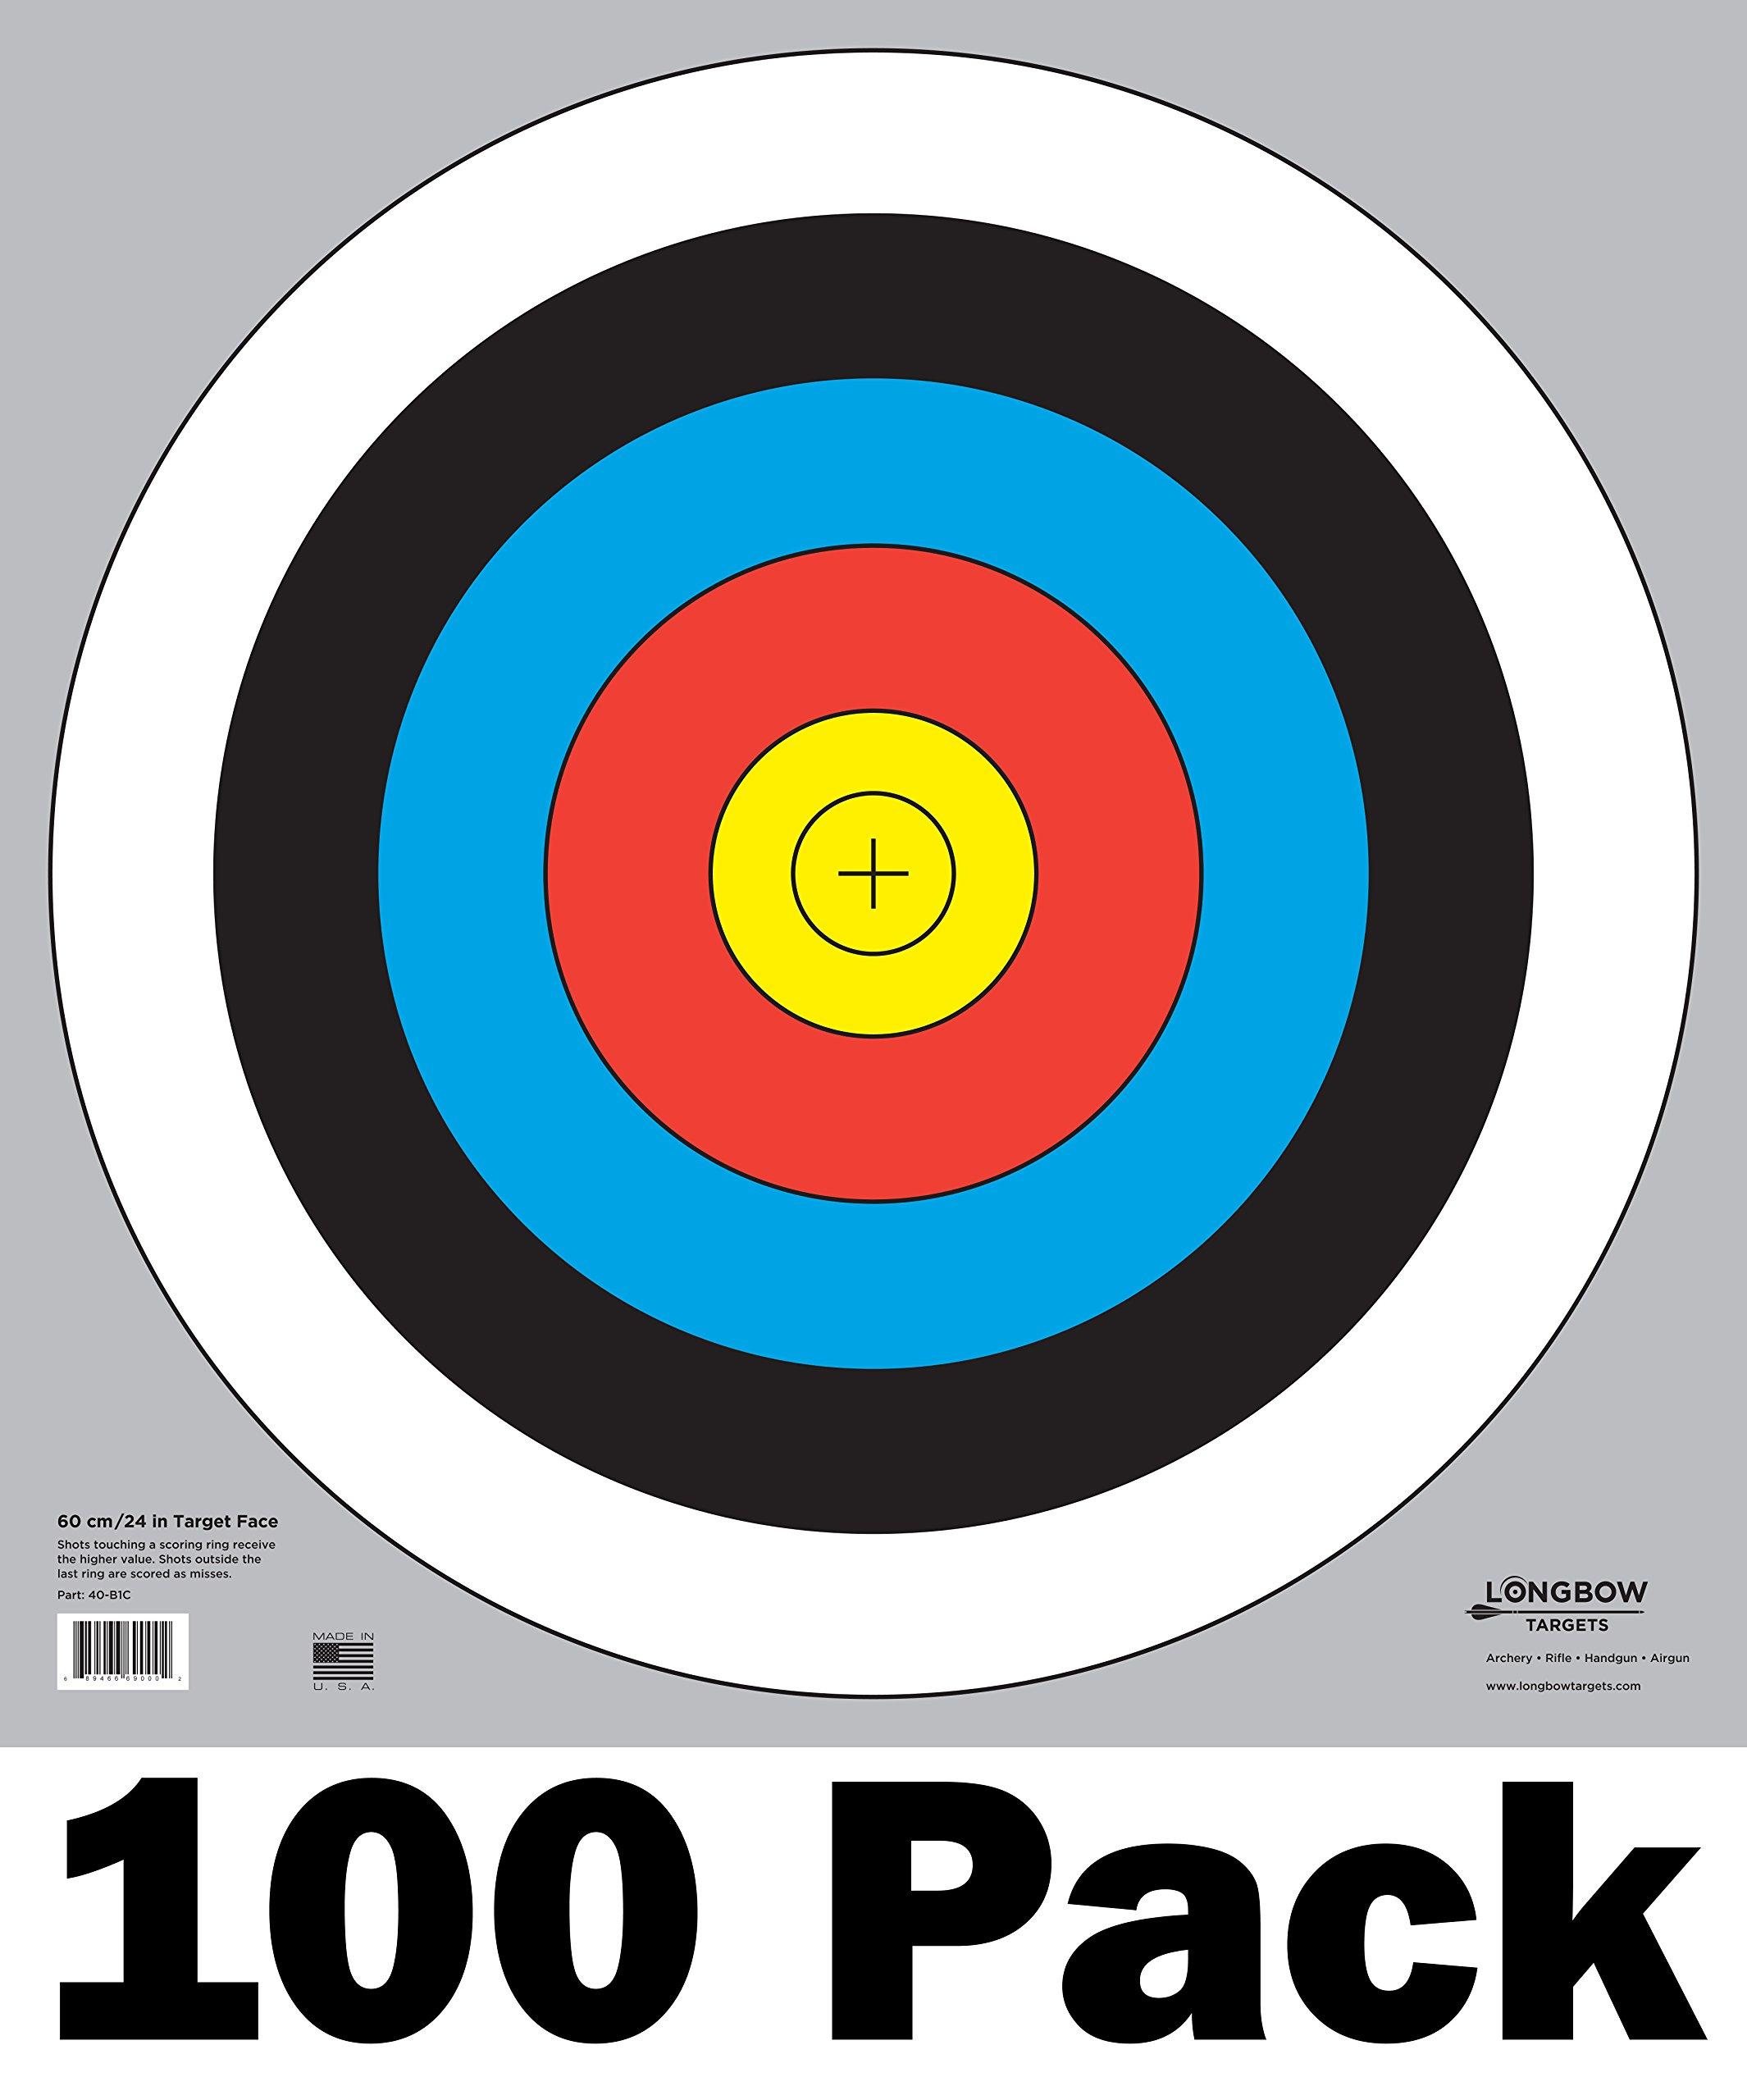 Longbow Targets 60 cm / 24 in Bullseye Archery and Gun Targets (100 Pack)